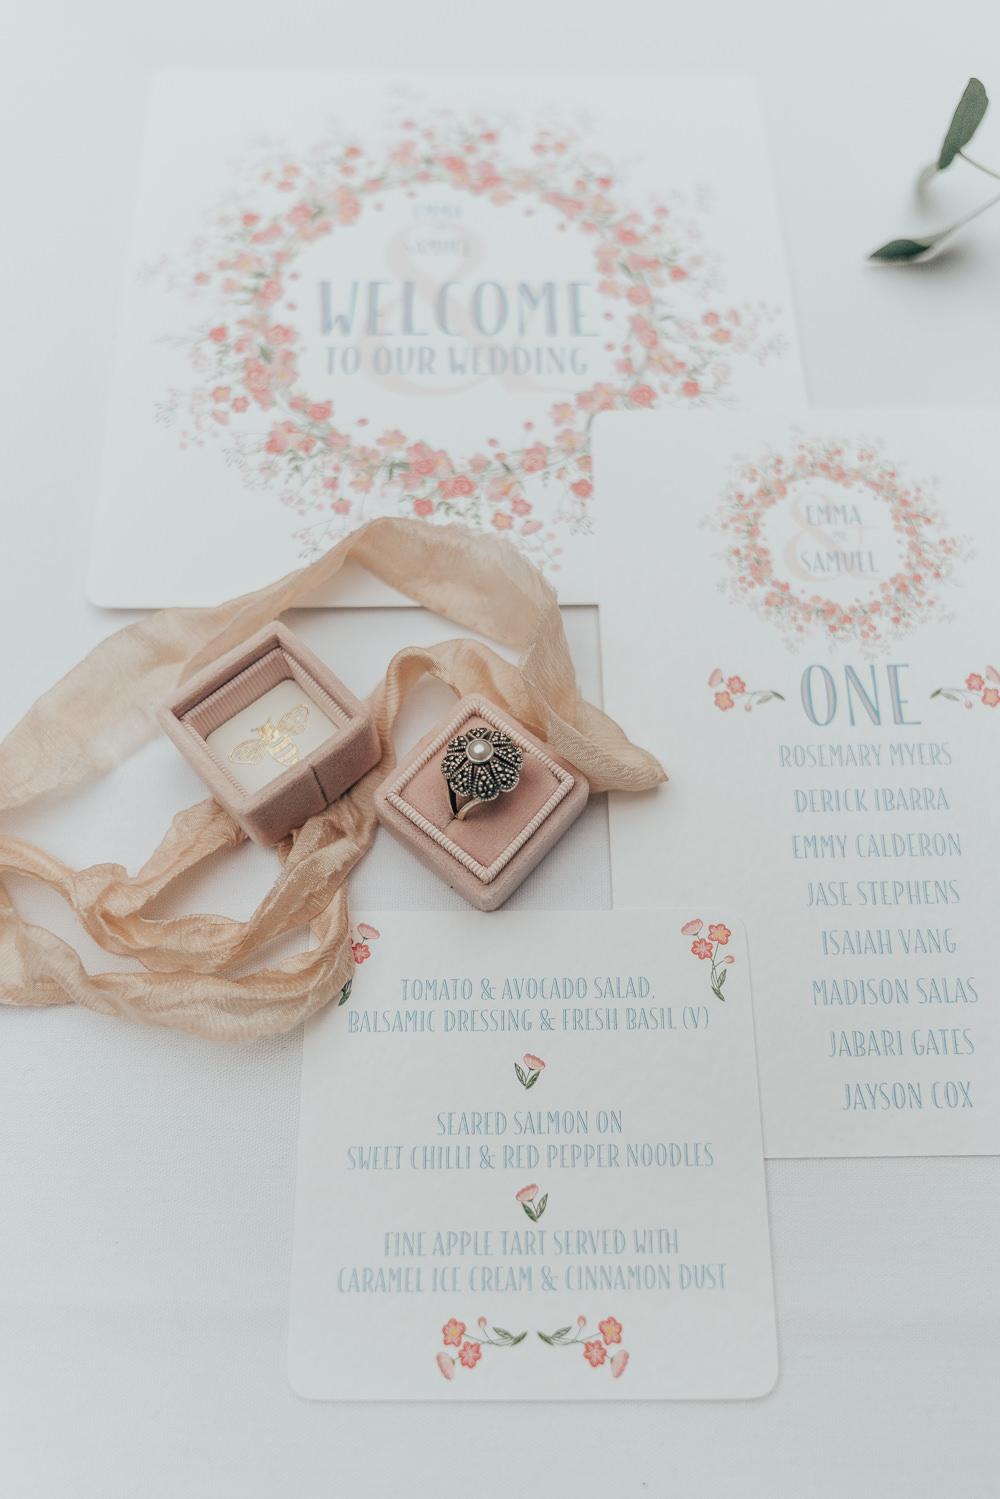 Stationery Invites Invitations Flat Lay Ribbon Flowers Floral Envelope Velvet Ring Box Hoop Wedding Ideas Rebecca Carpenter Photography